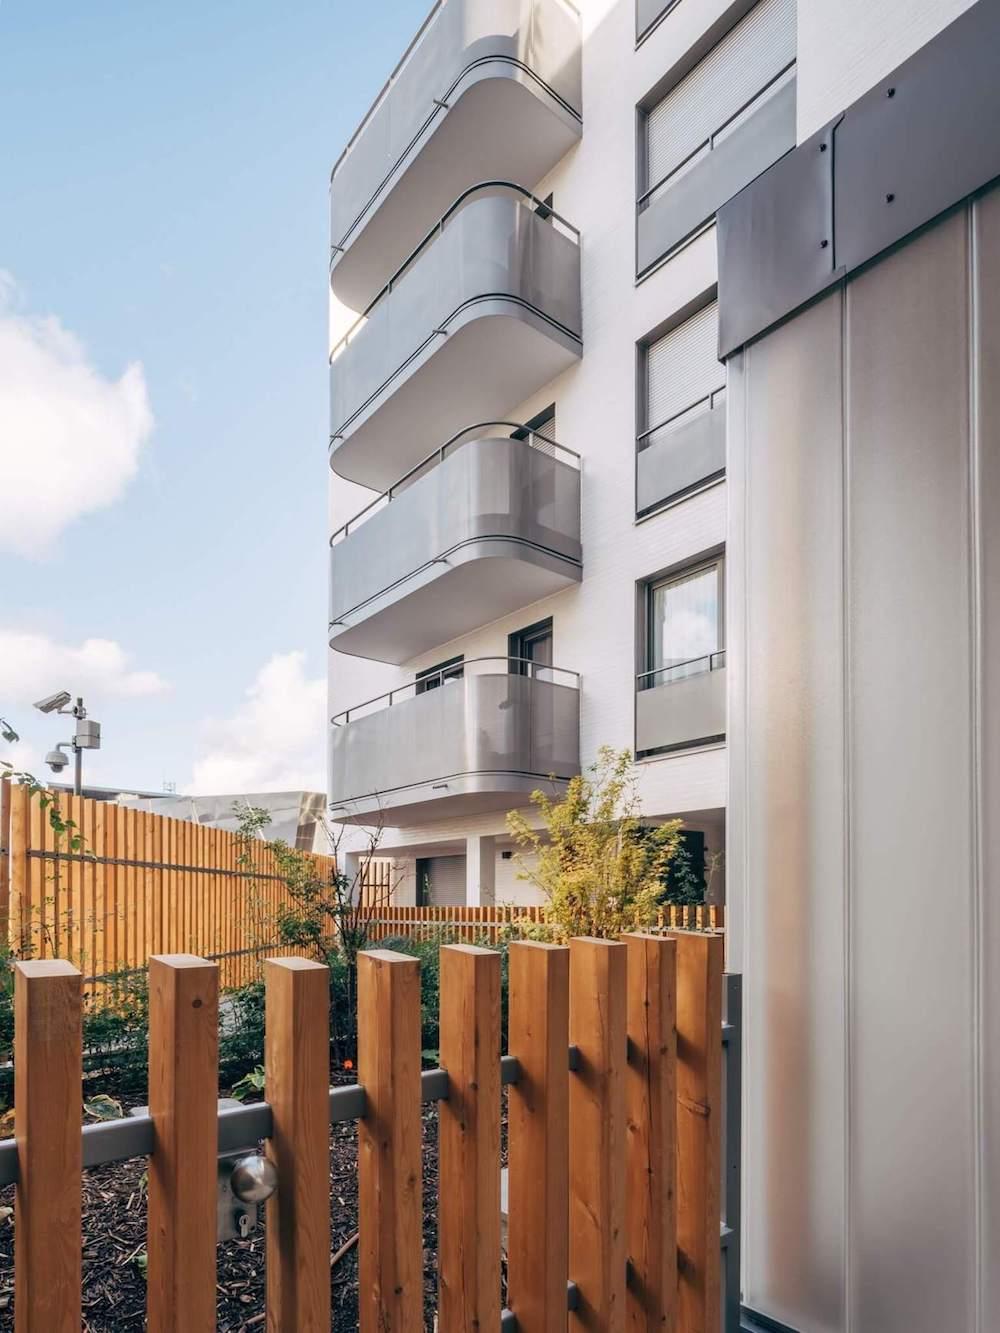 Interior garden in a building with metal balconies.